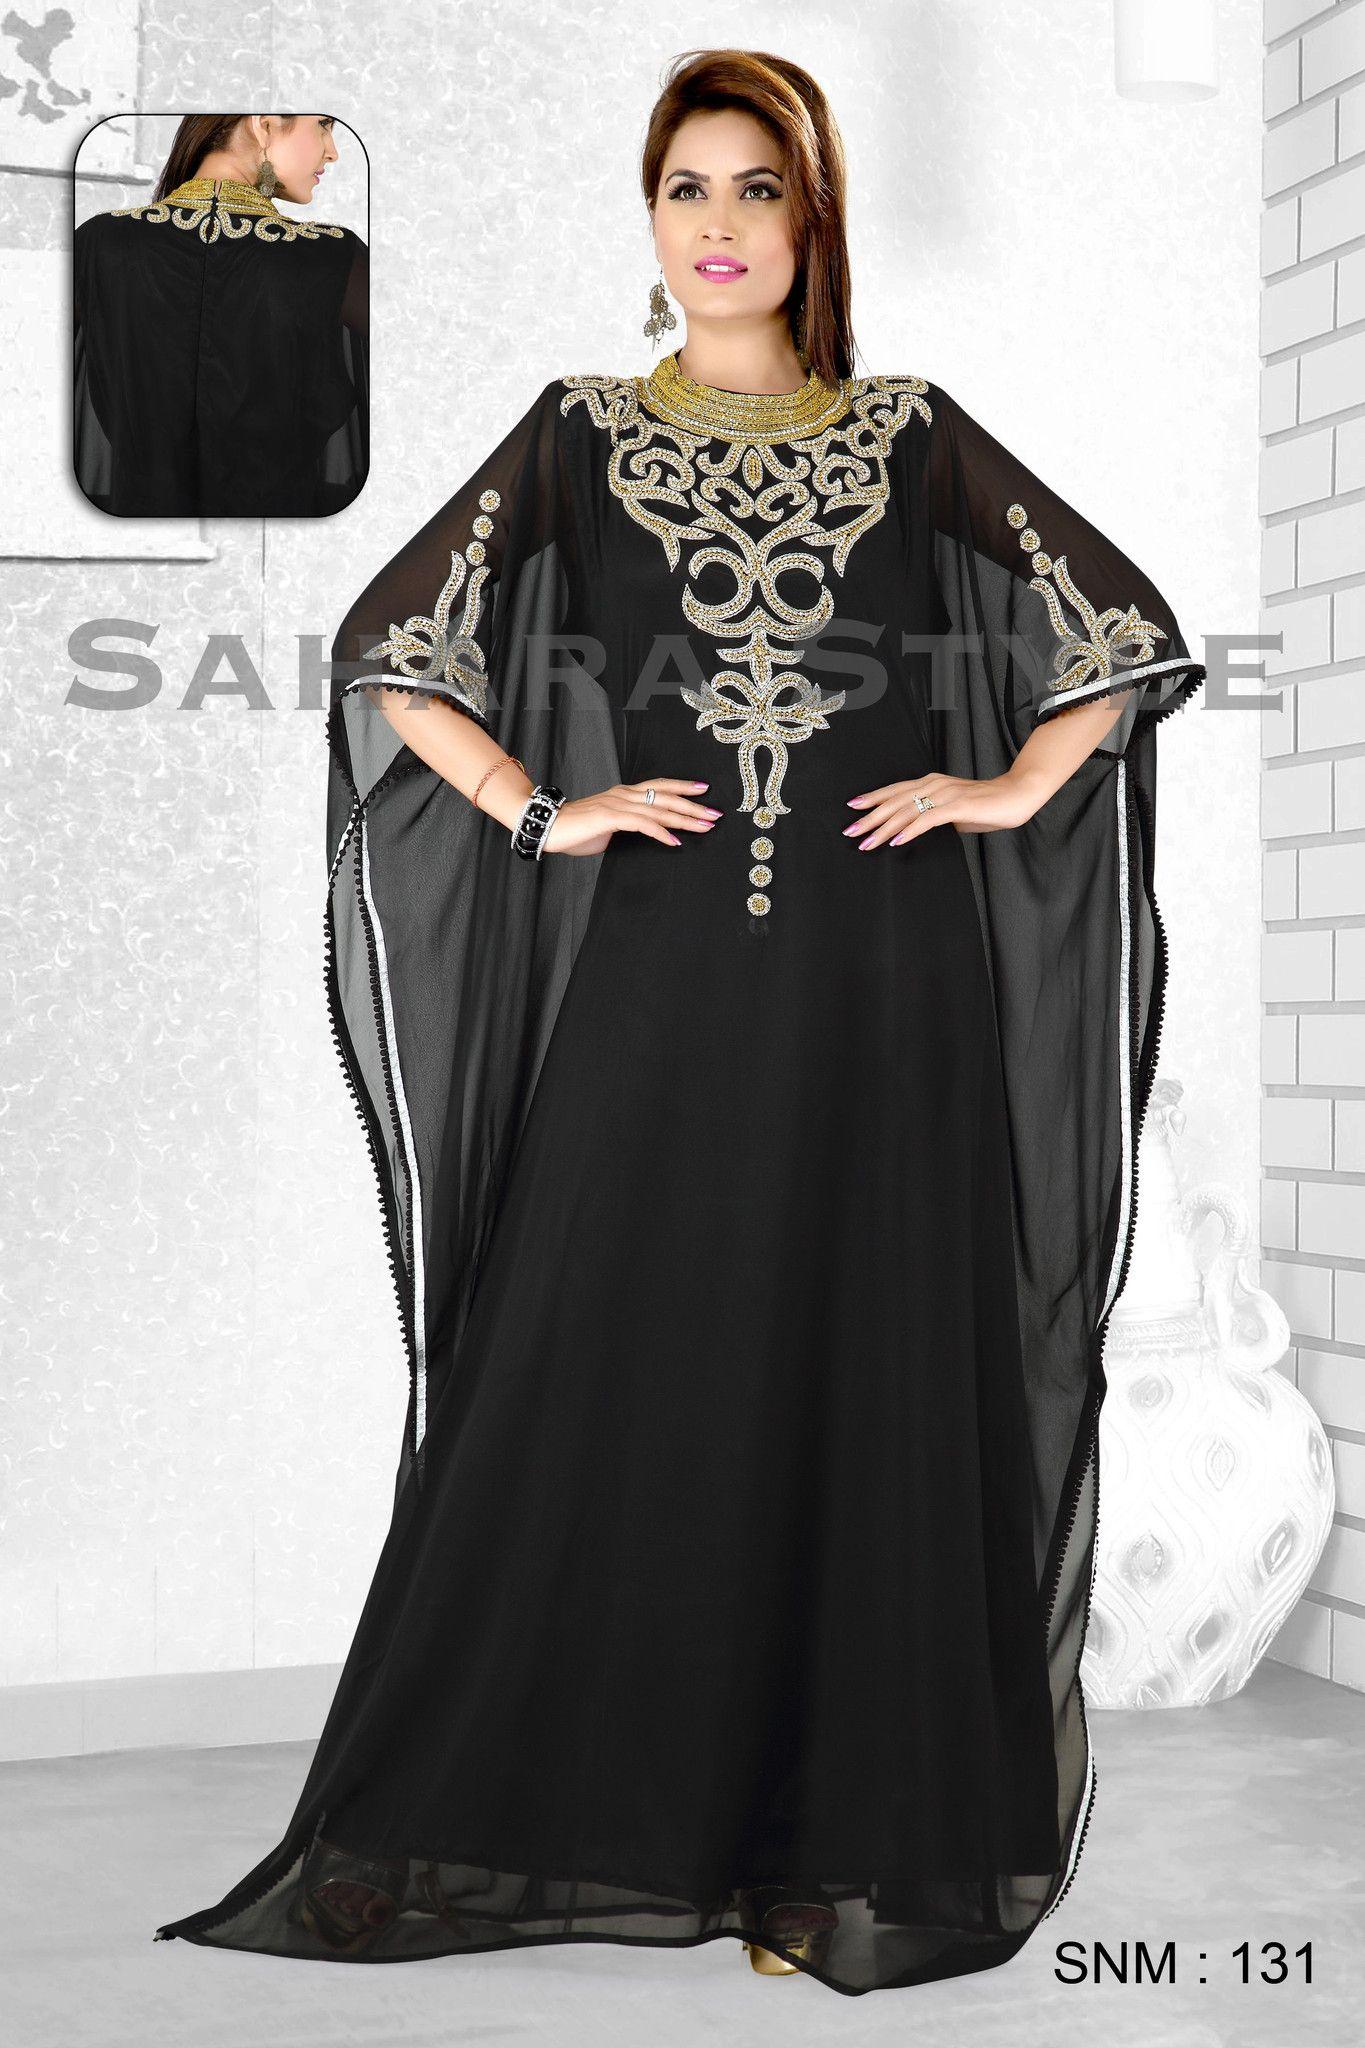 Embellished Arabian colorful kaftan jilbab photo